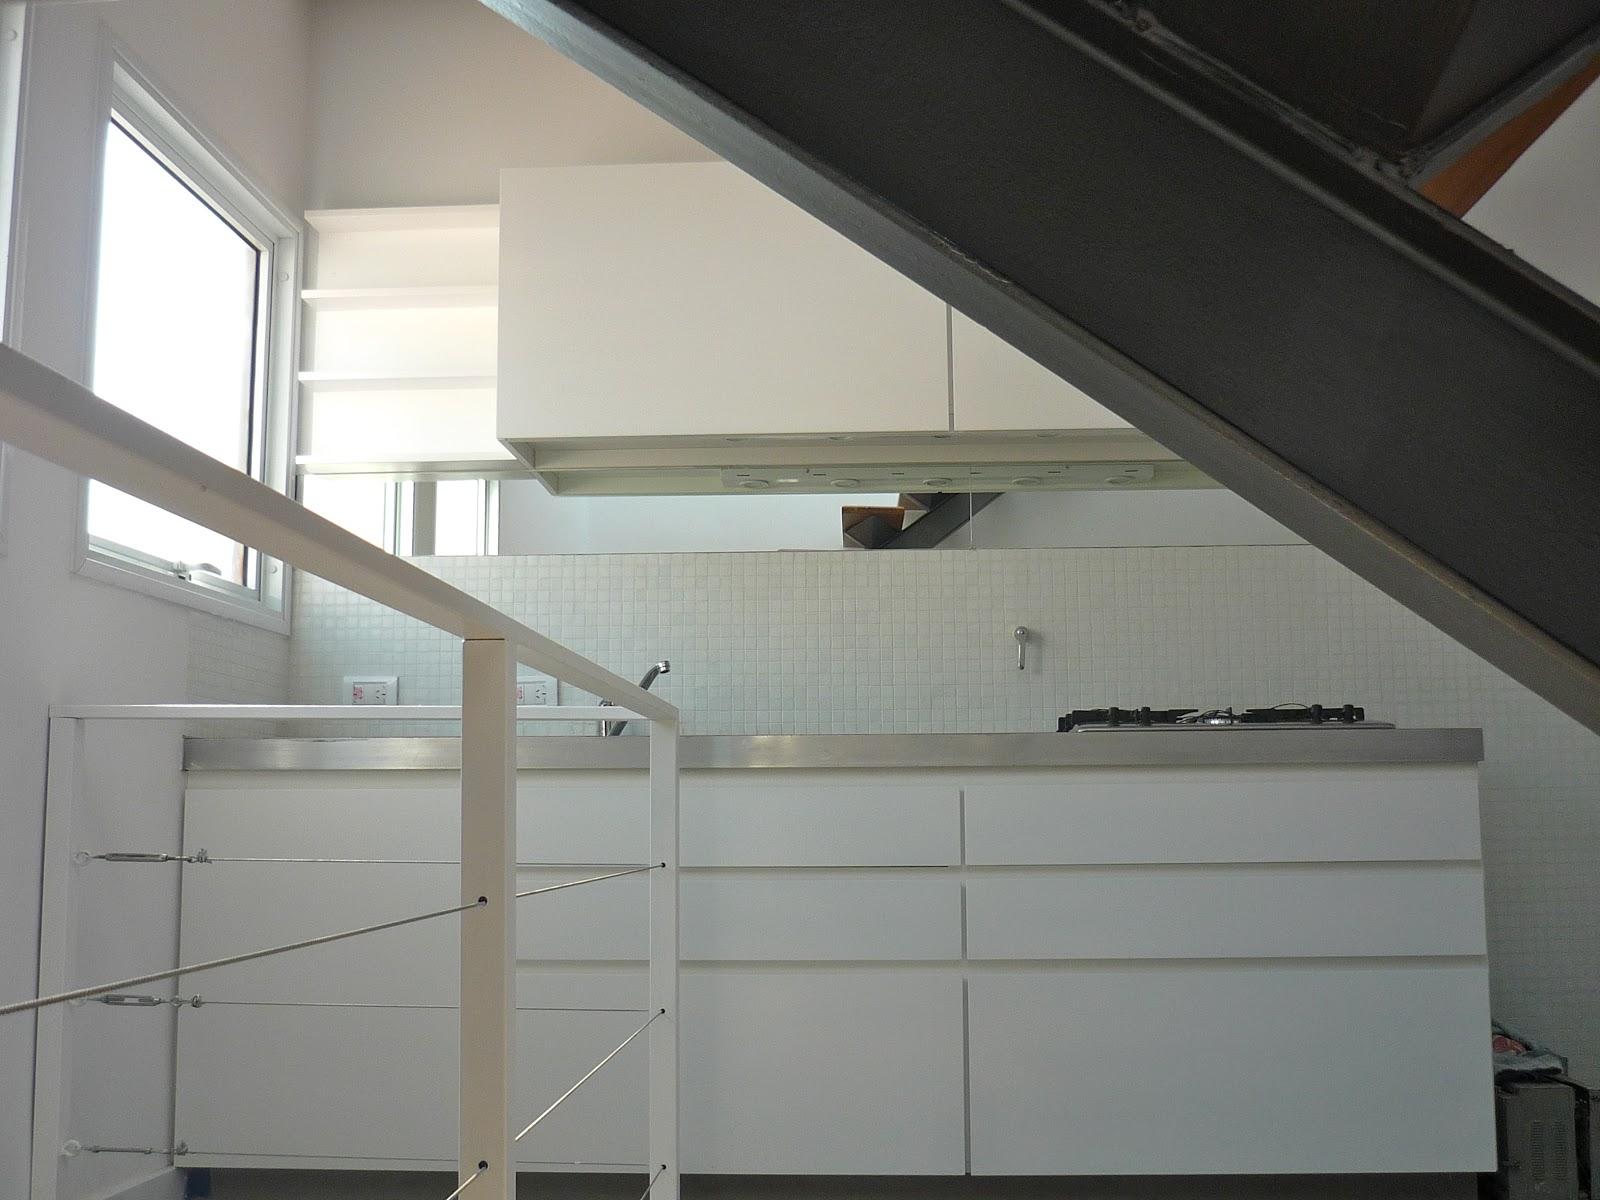 Kasa cocina minimalista blanca white minimalist kitchen for Kasa diseno interior